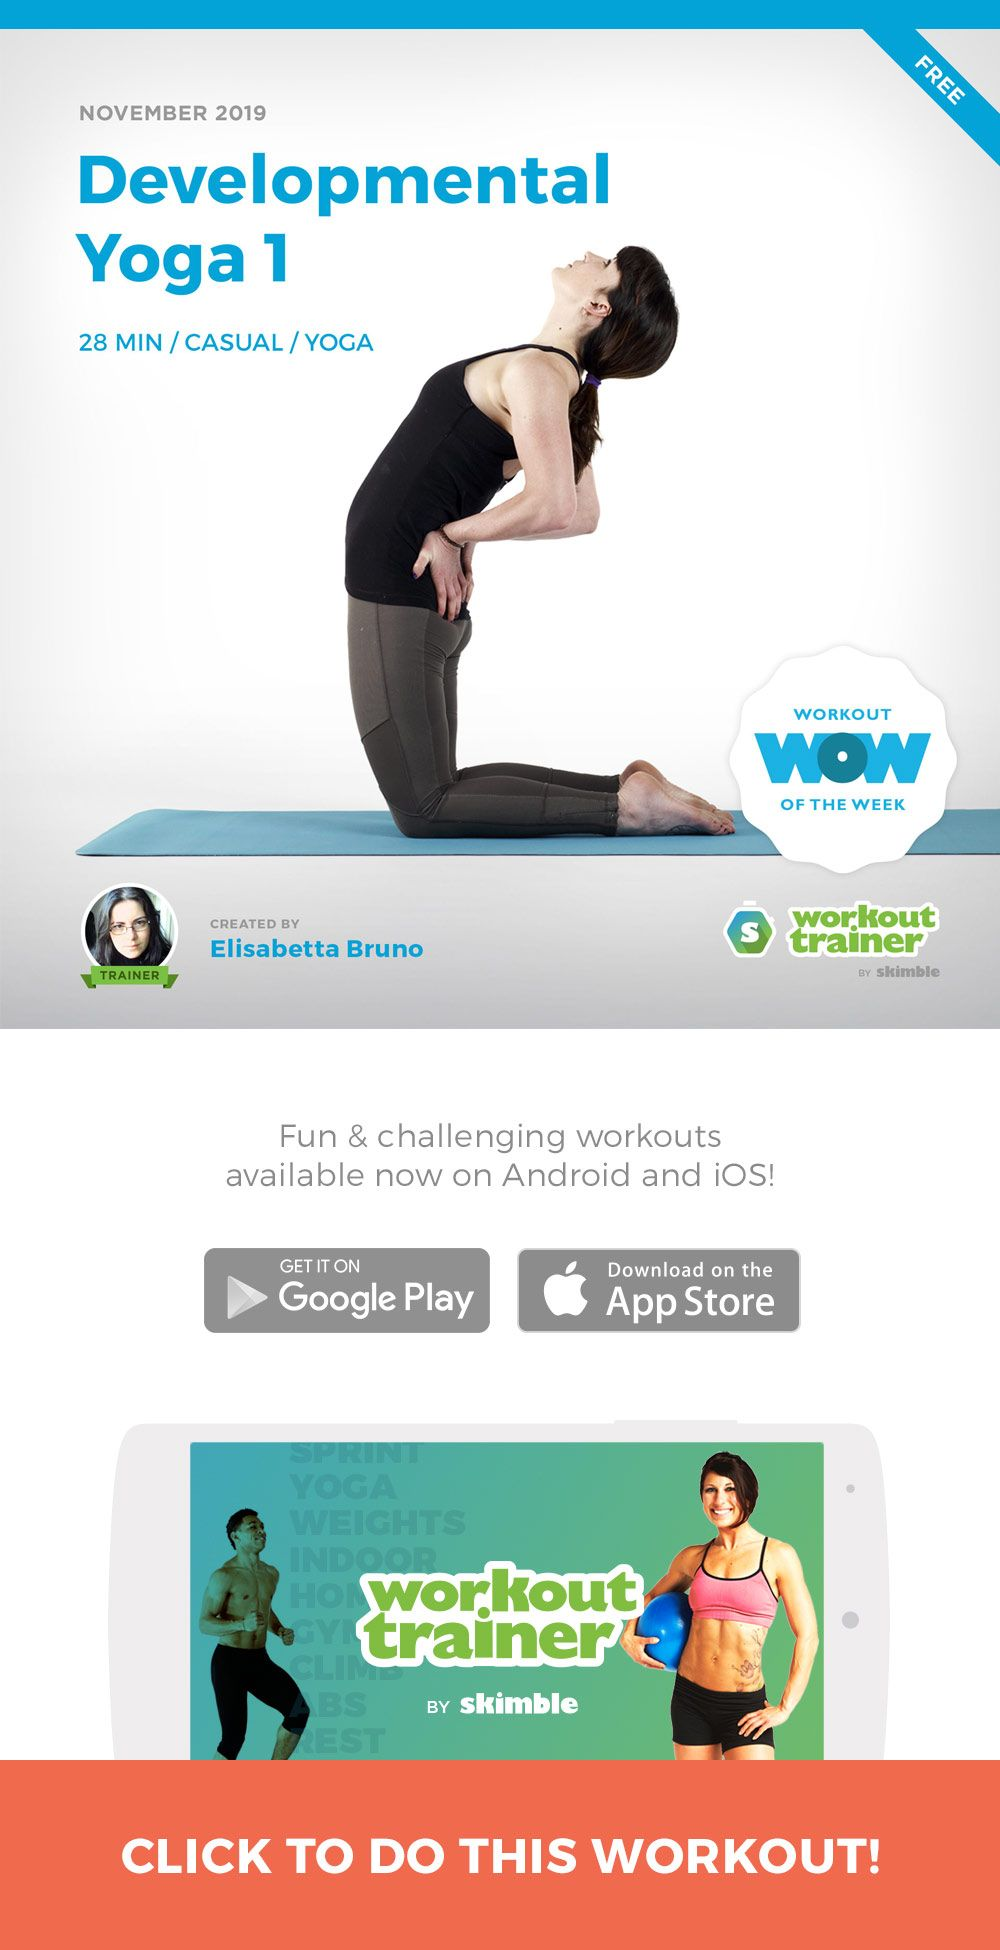 Developmental Yoga 1 Workout, Online personal training